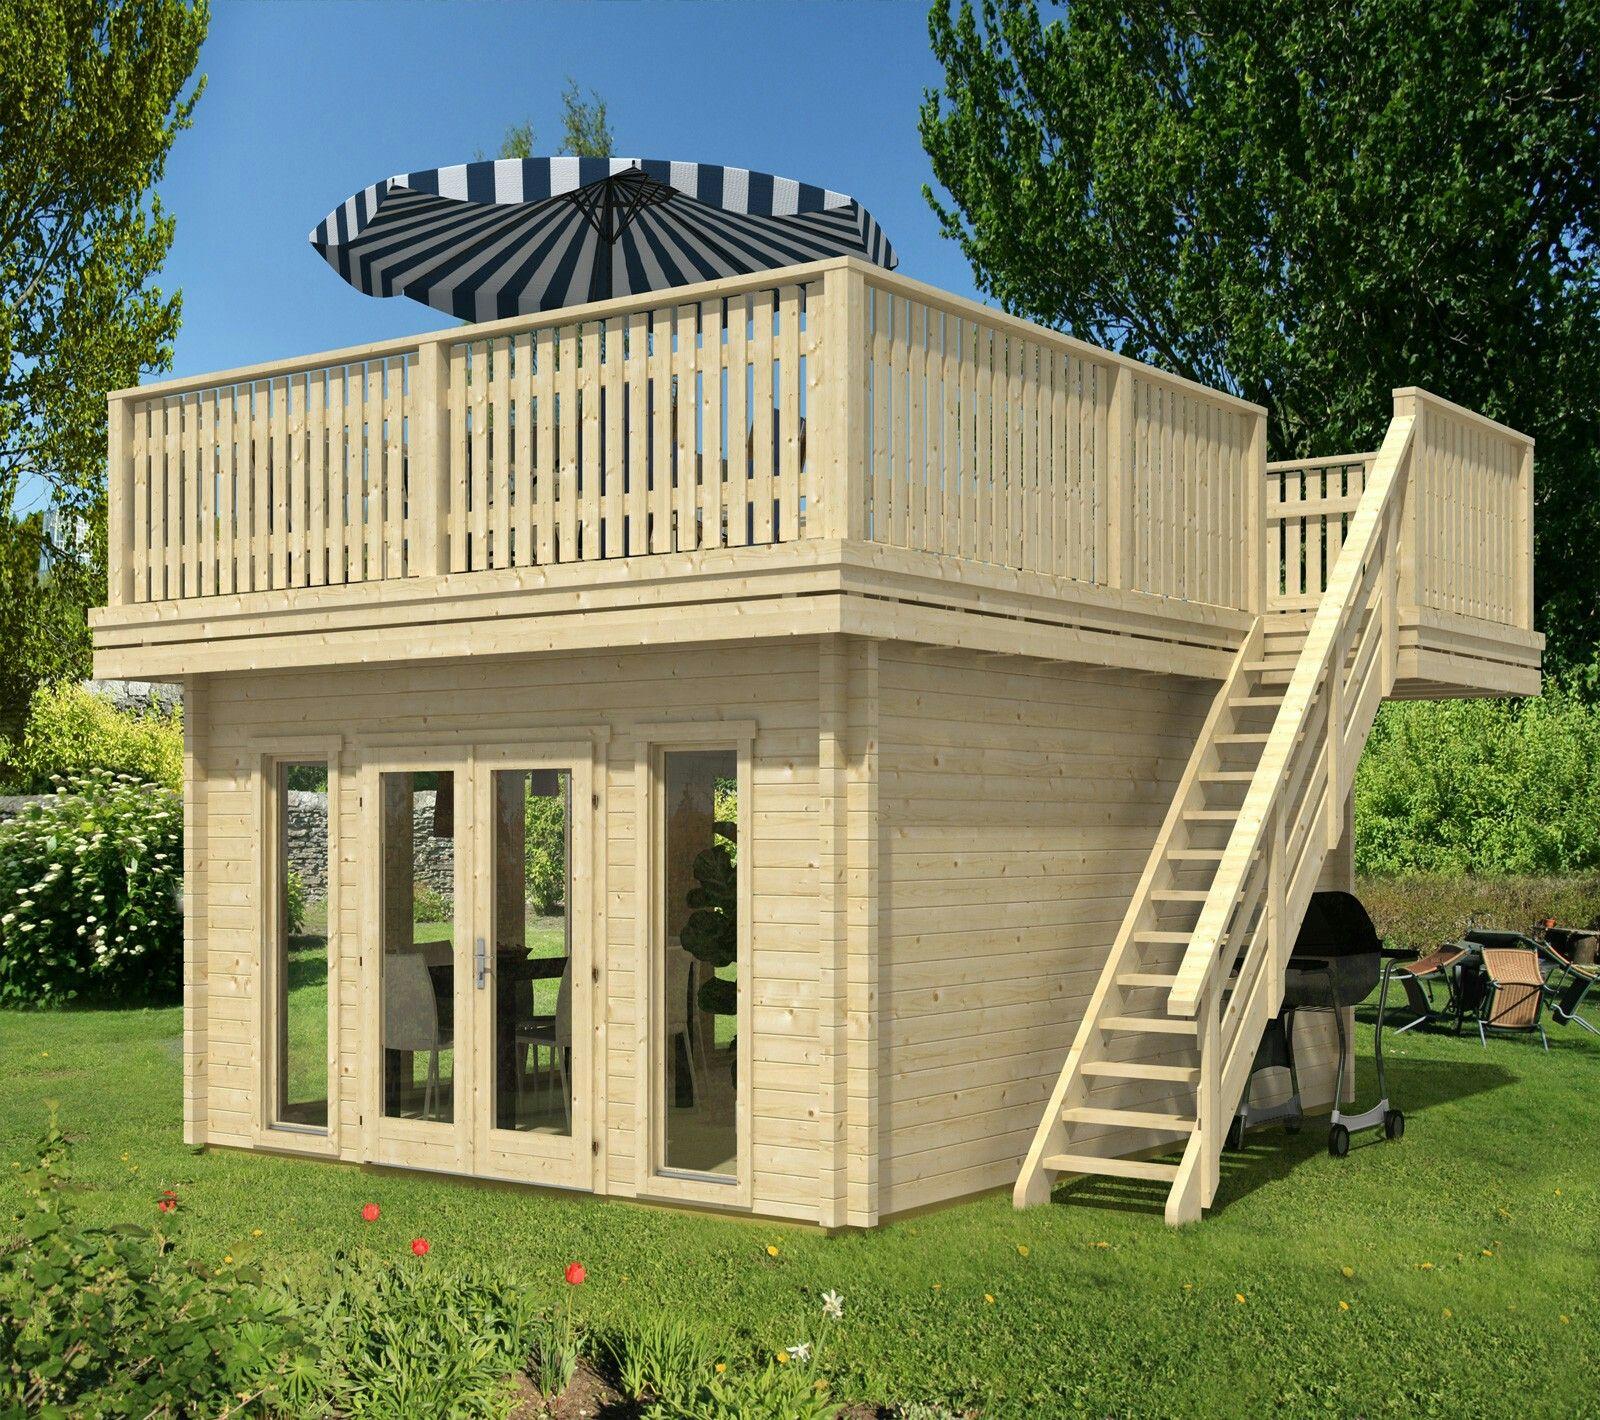 Gartenhaus Mit Dachterrasse Backyard Tiny House Design Small House